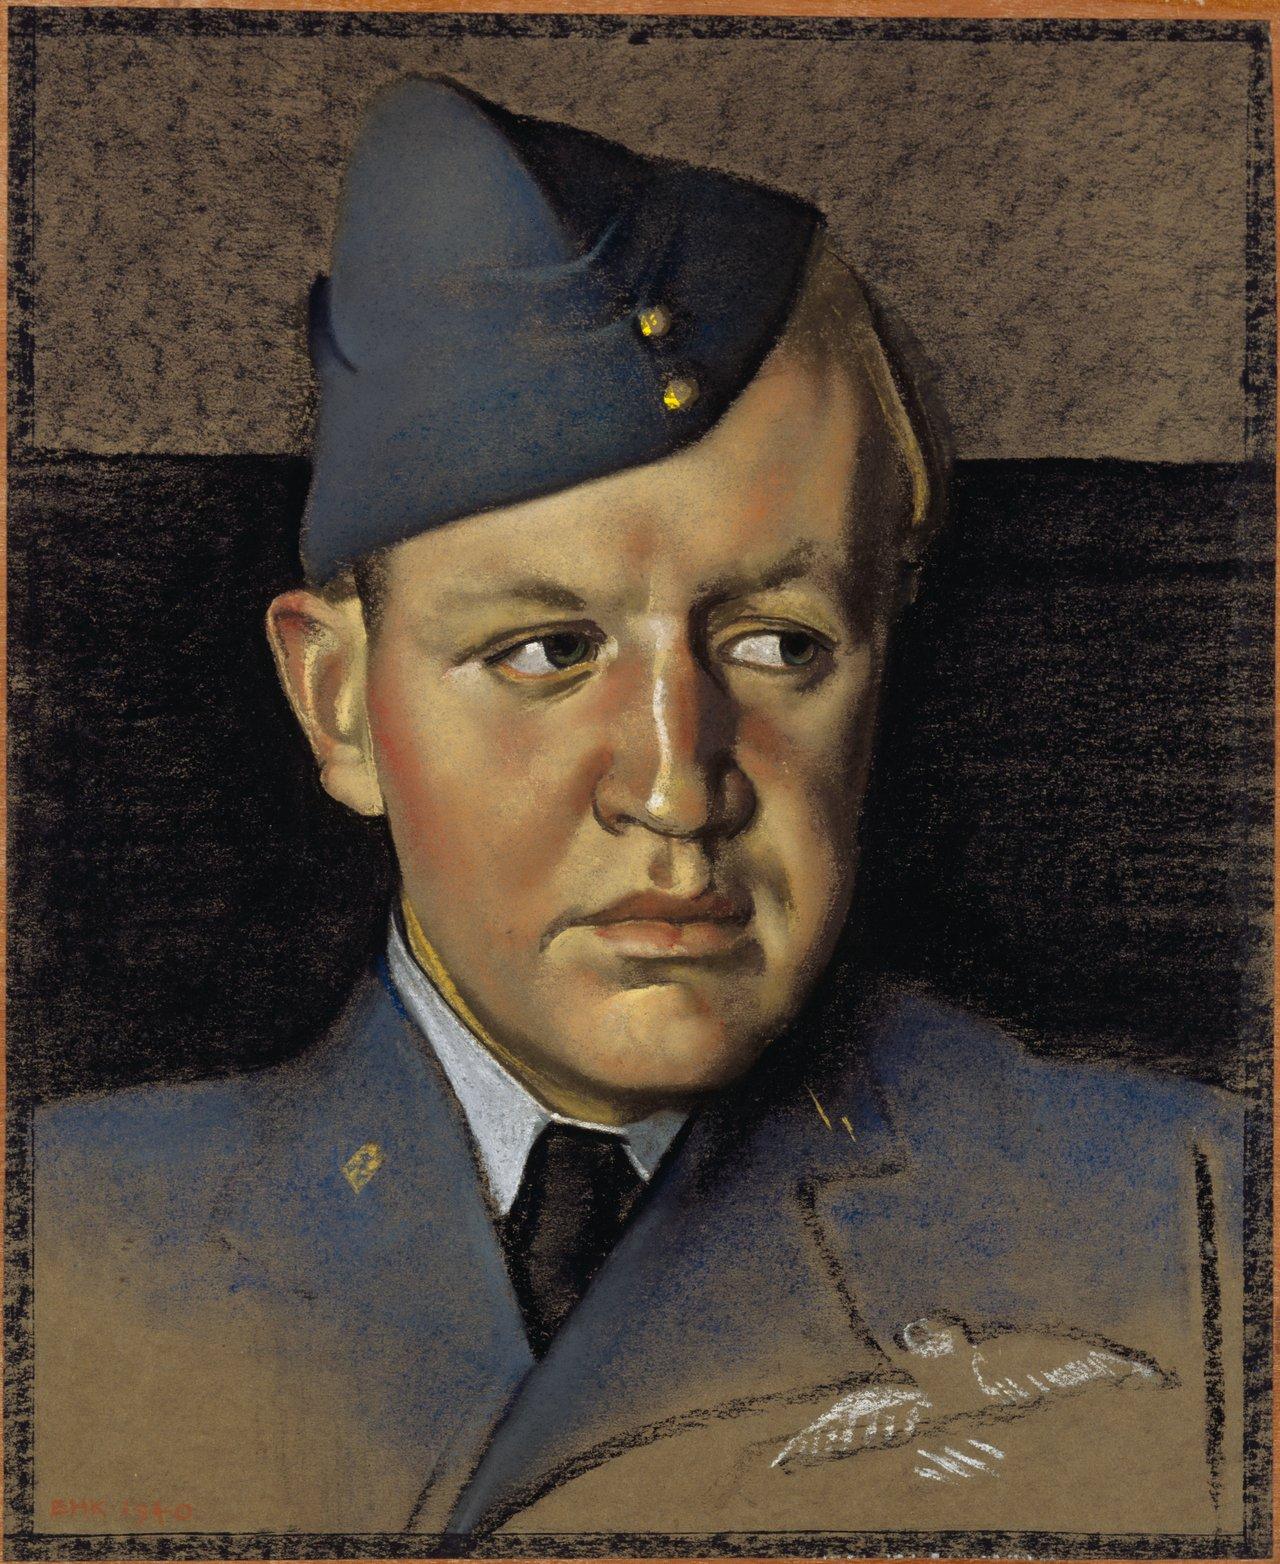 Flight Lieutenant Lloyd Watt Coleman, DFC, by Eric Kennington (1940)